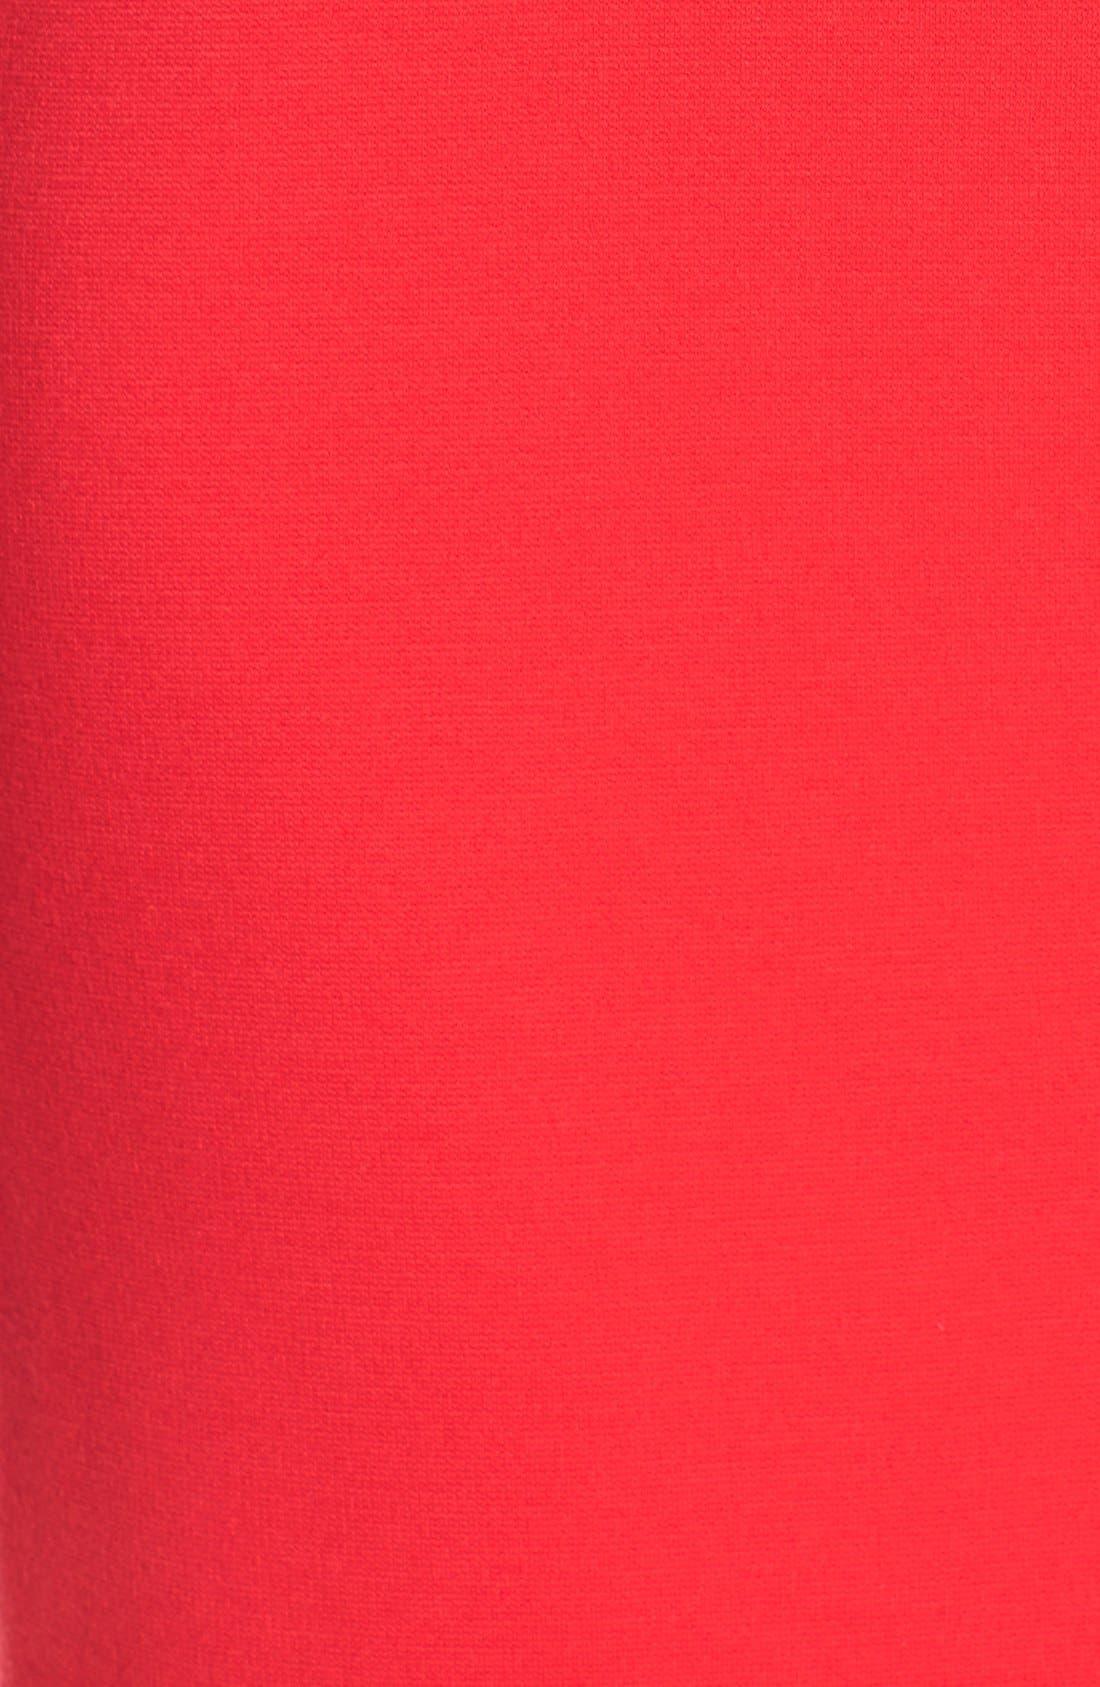 V-Neck Crepe Sheath Dress,                             Alternate thumbnail 5, color,                             Salsa